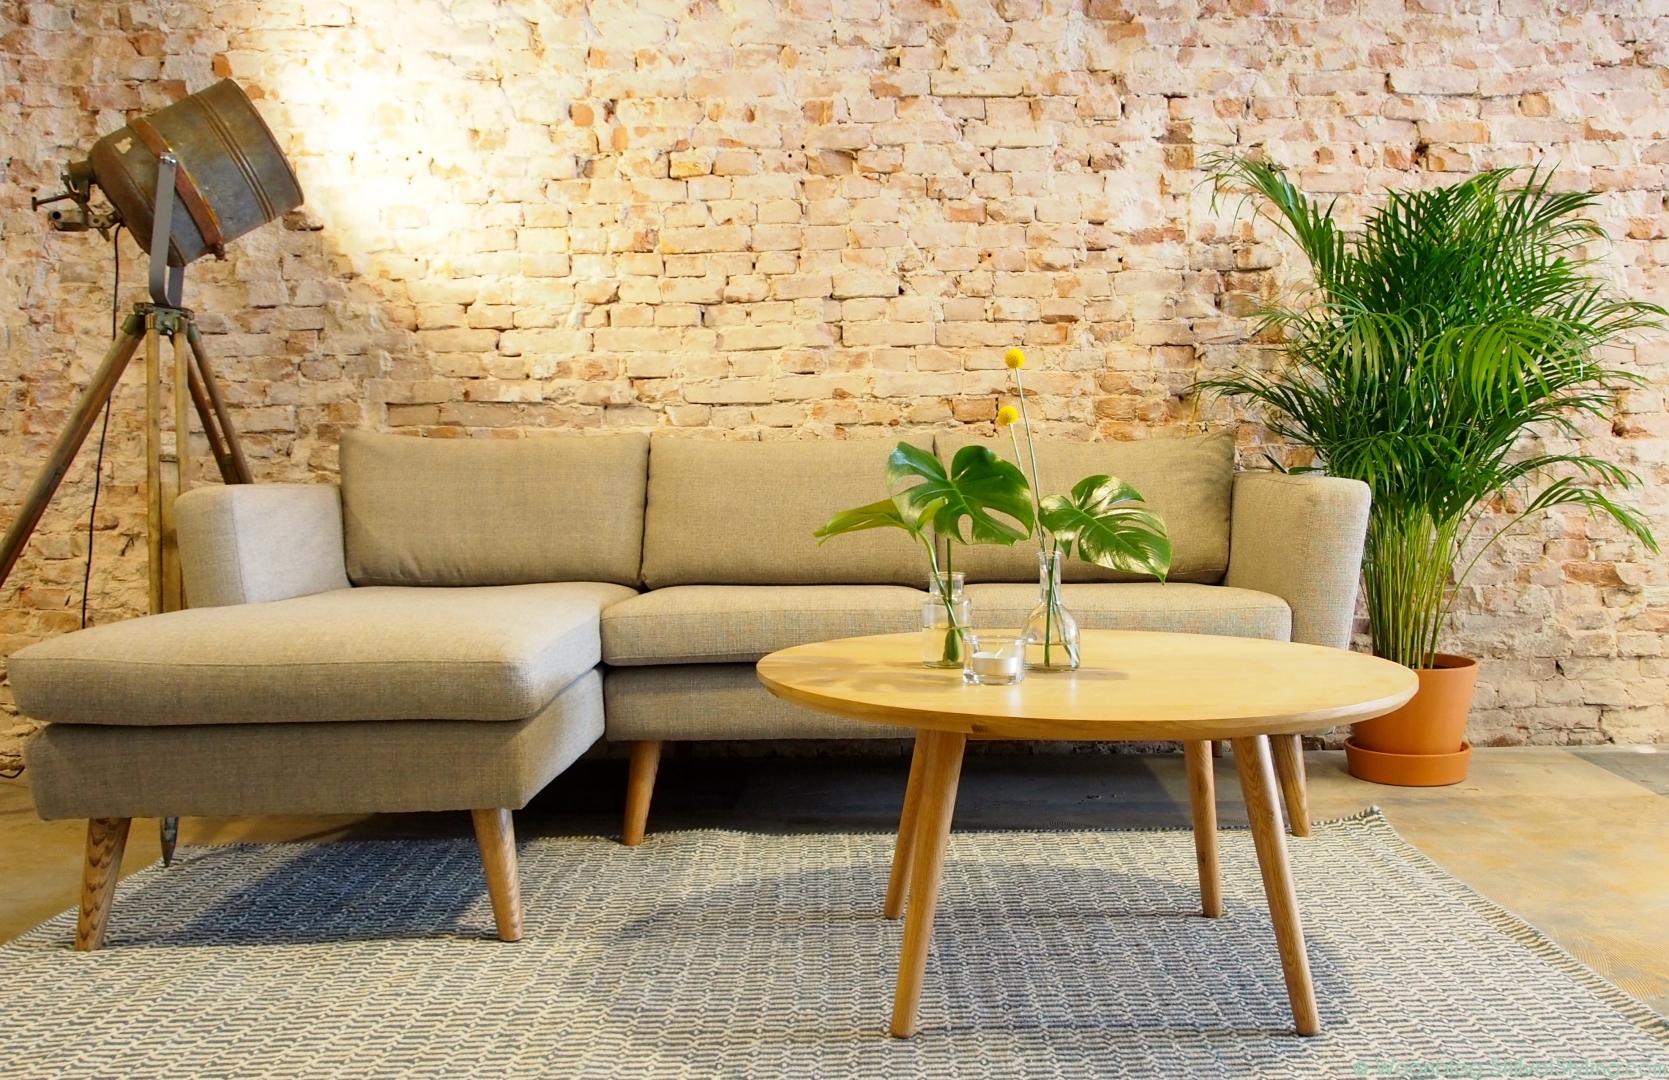 Interieur 39 mood corner 39 styling bij de sofacompany pop up store stijlvol styling woonblog - Klein interieur ruimte ...